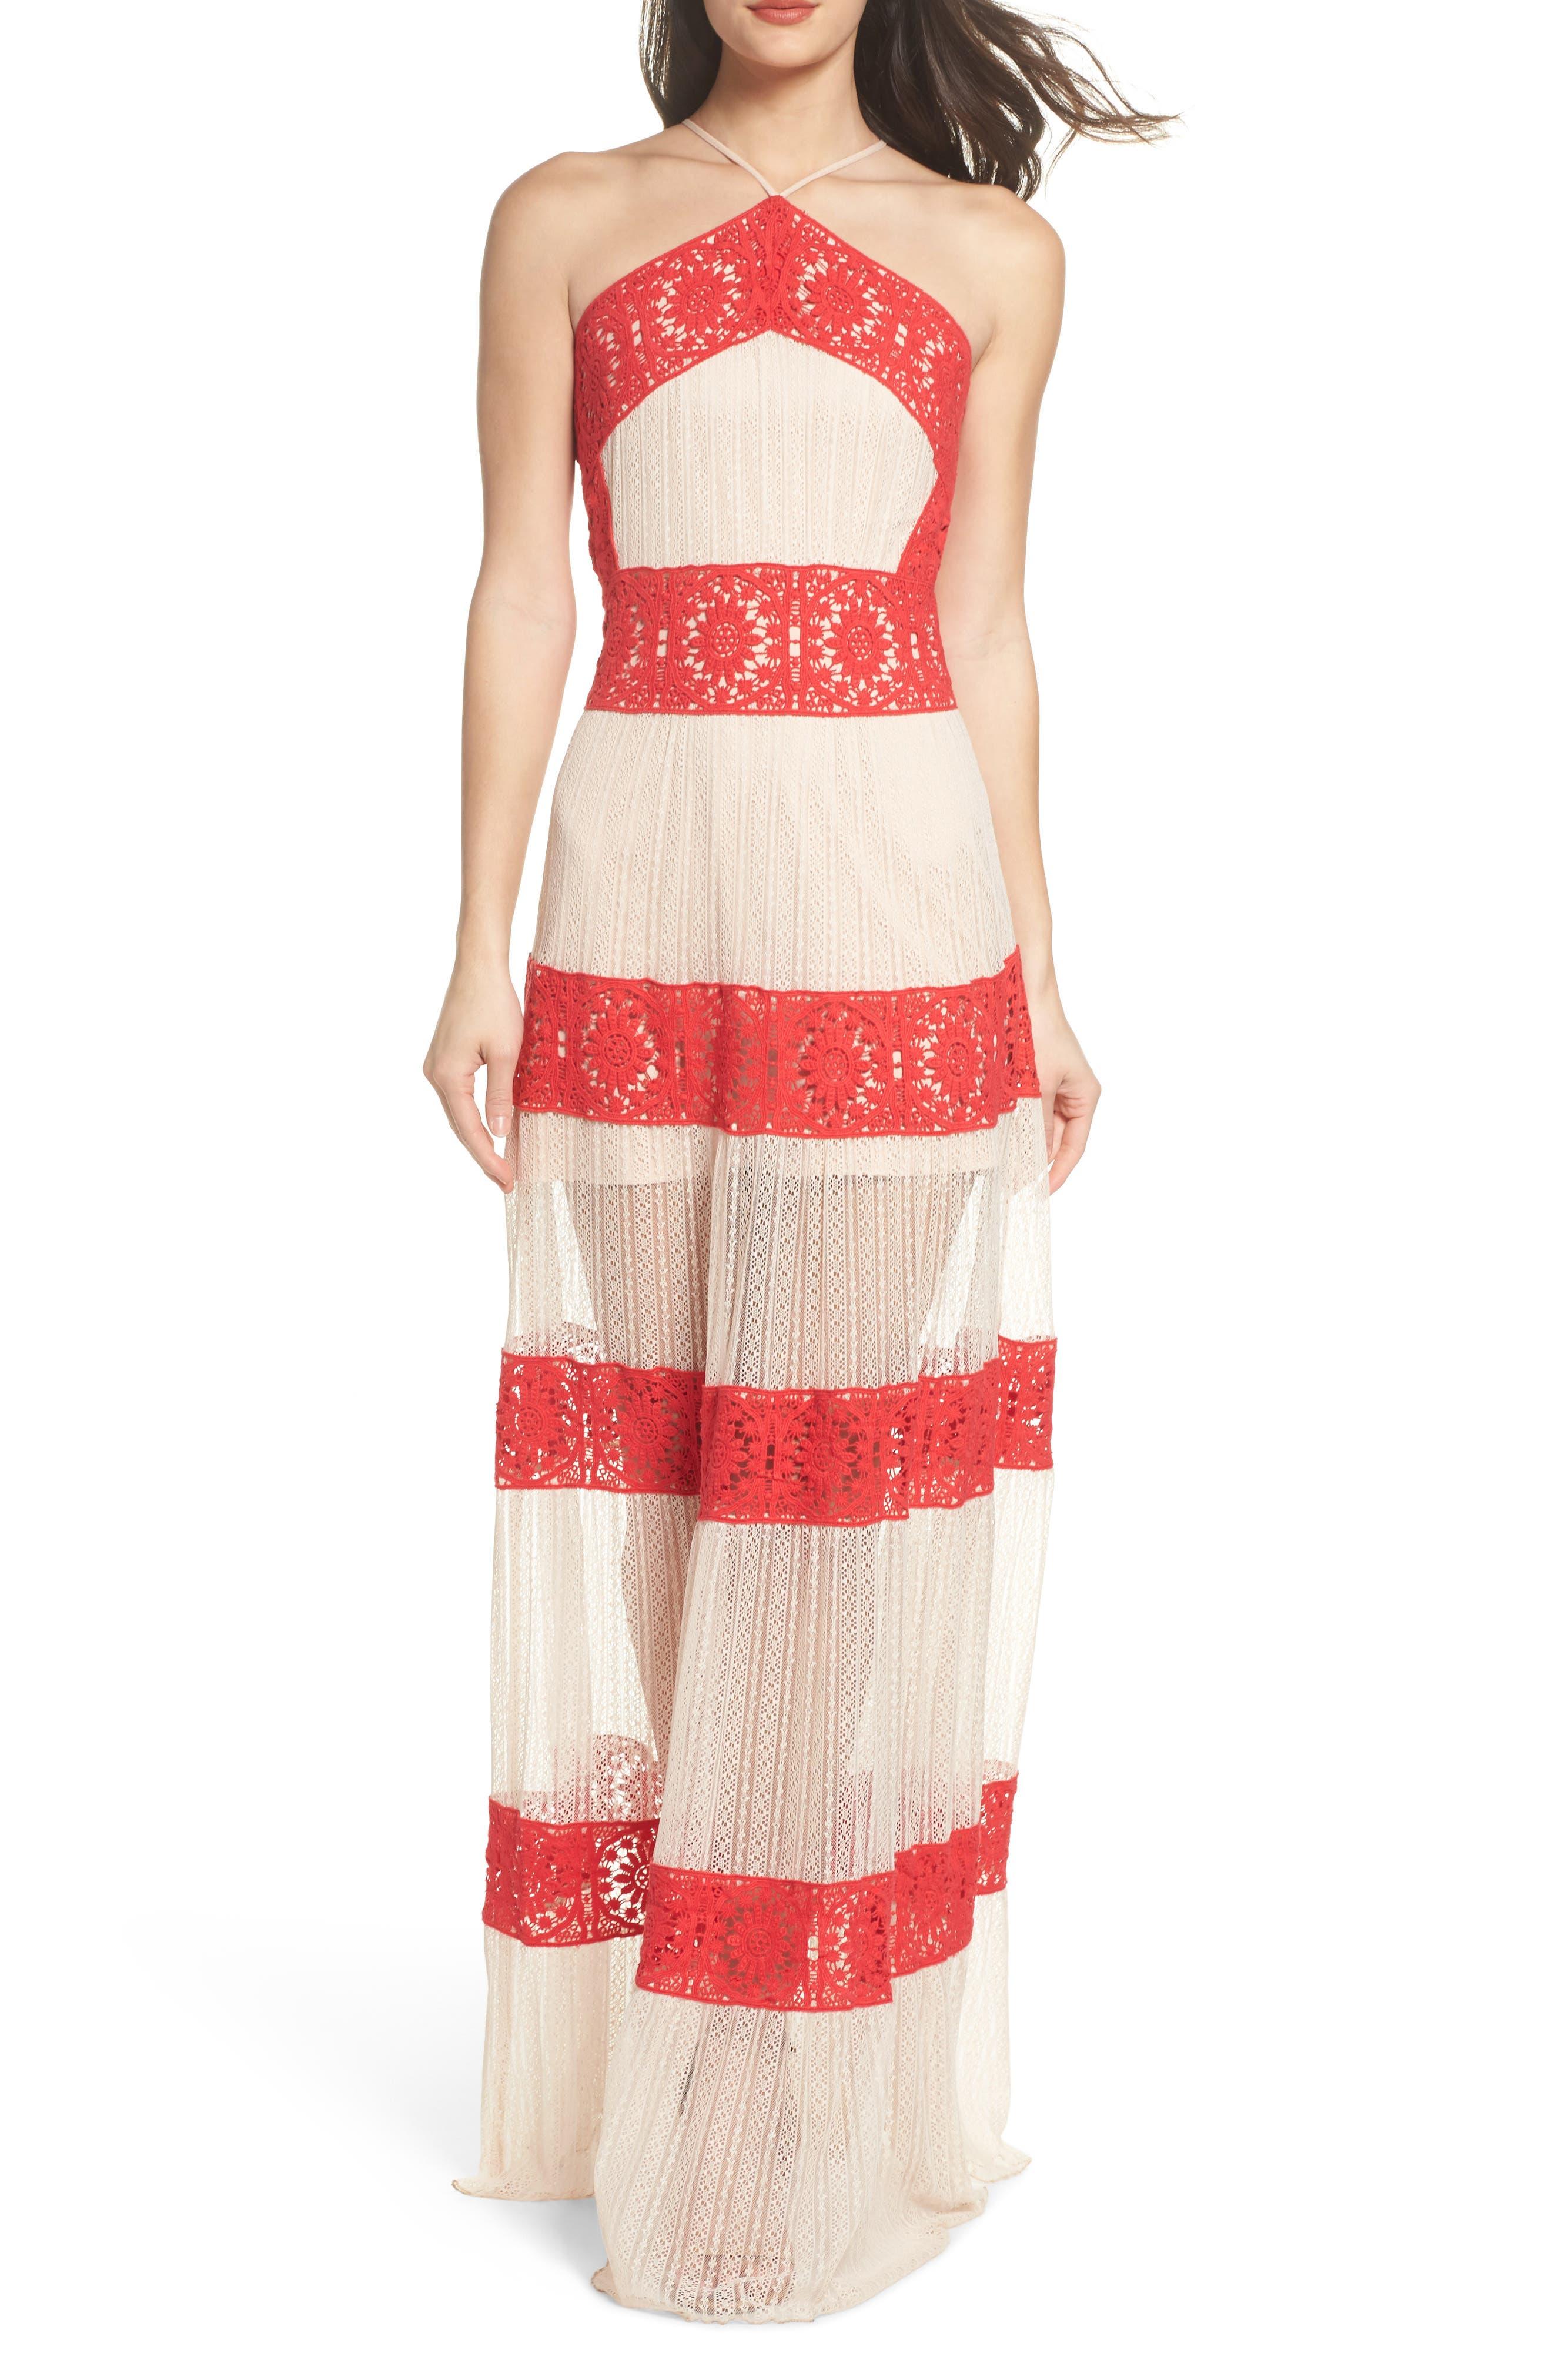 Ophelia Two-Tone Lace Maxi Dress,                             Main thumbnail 1, color,                             250